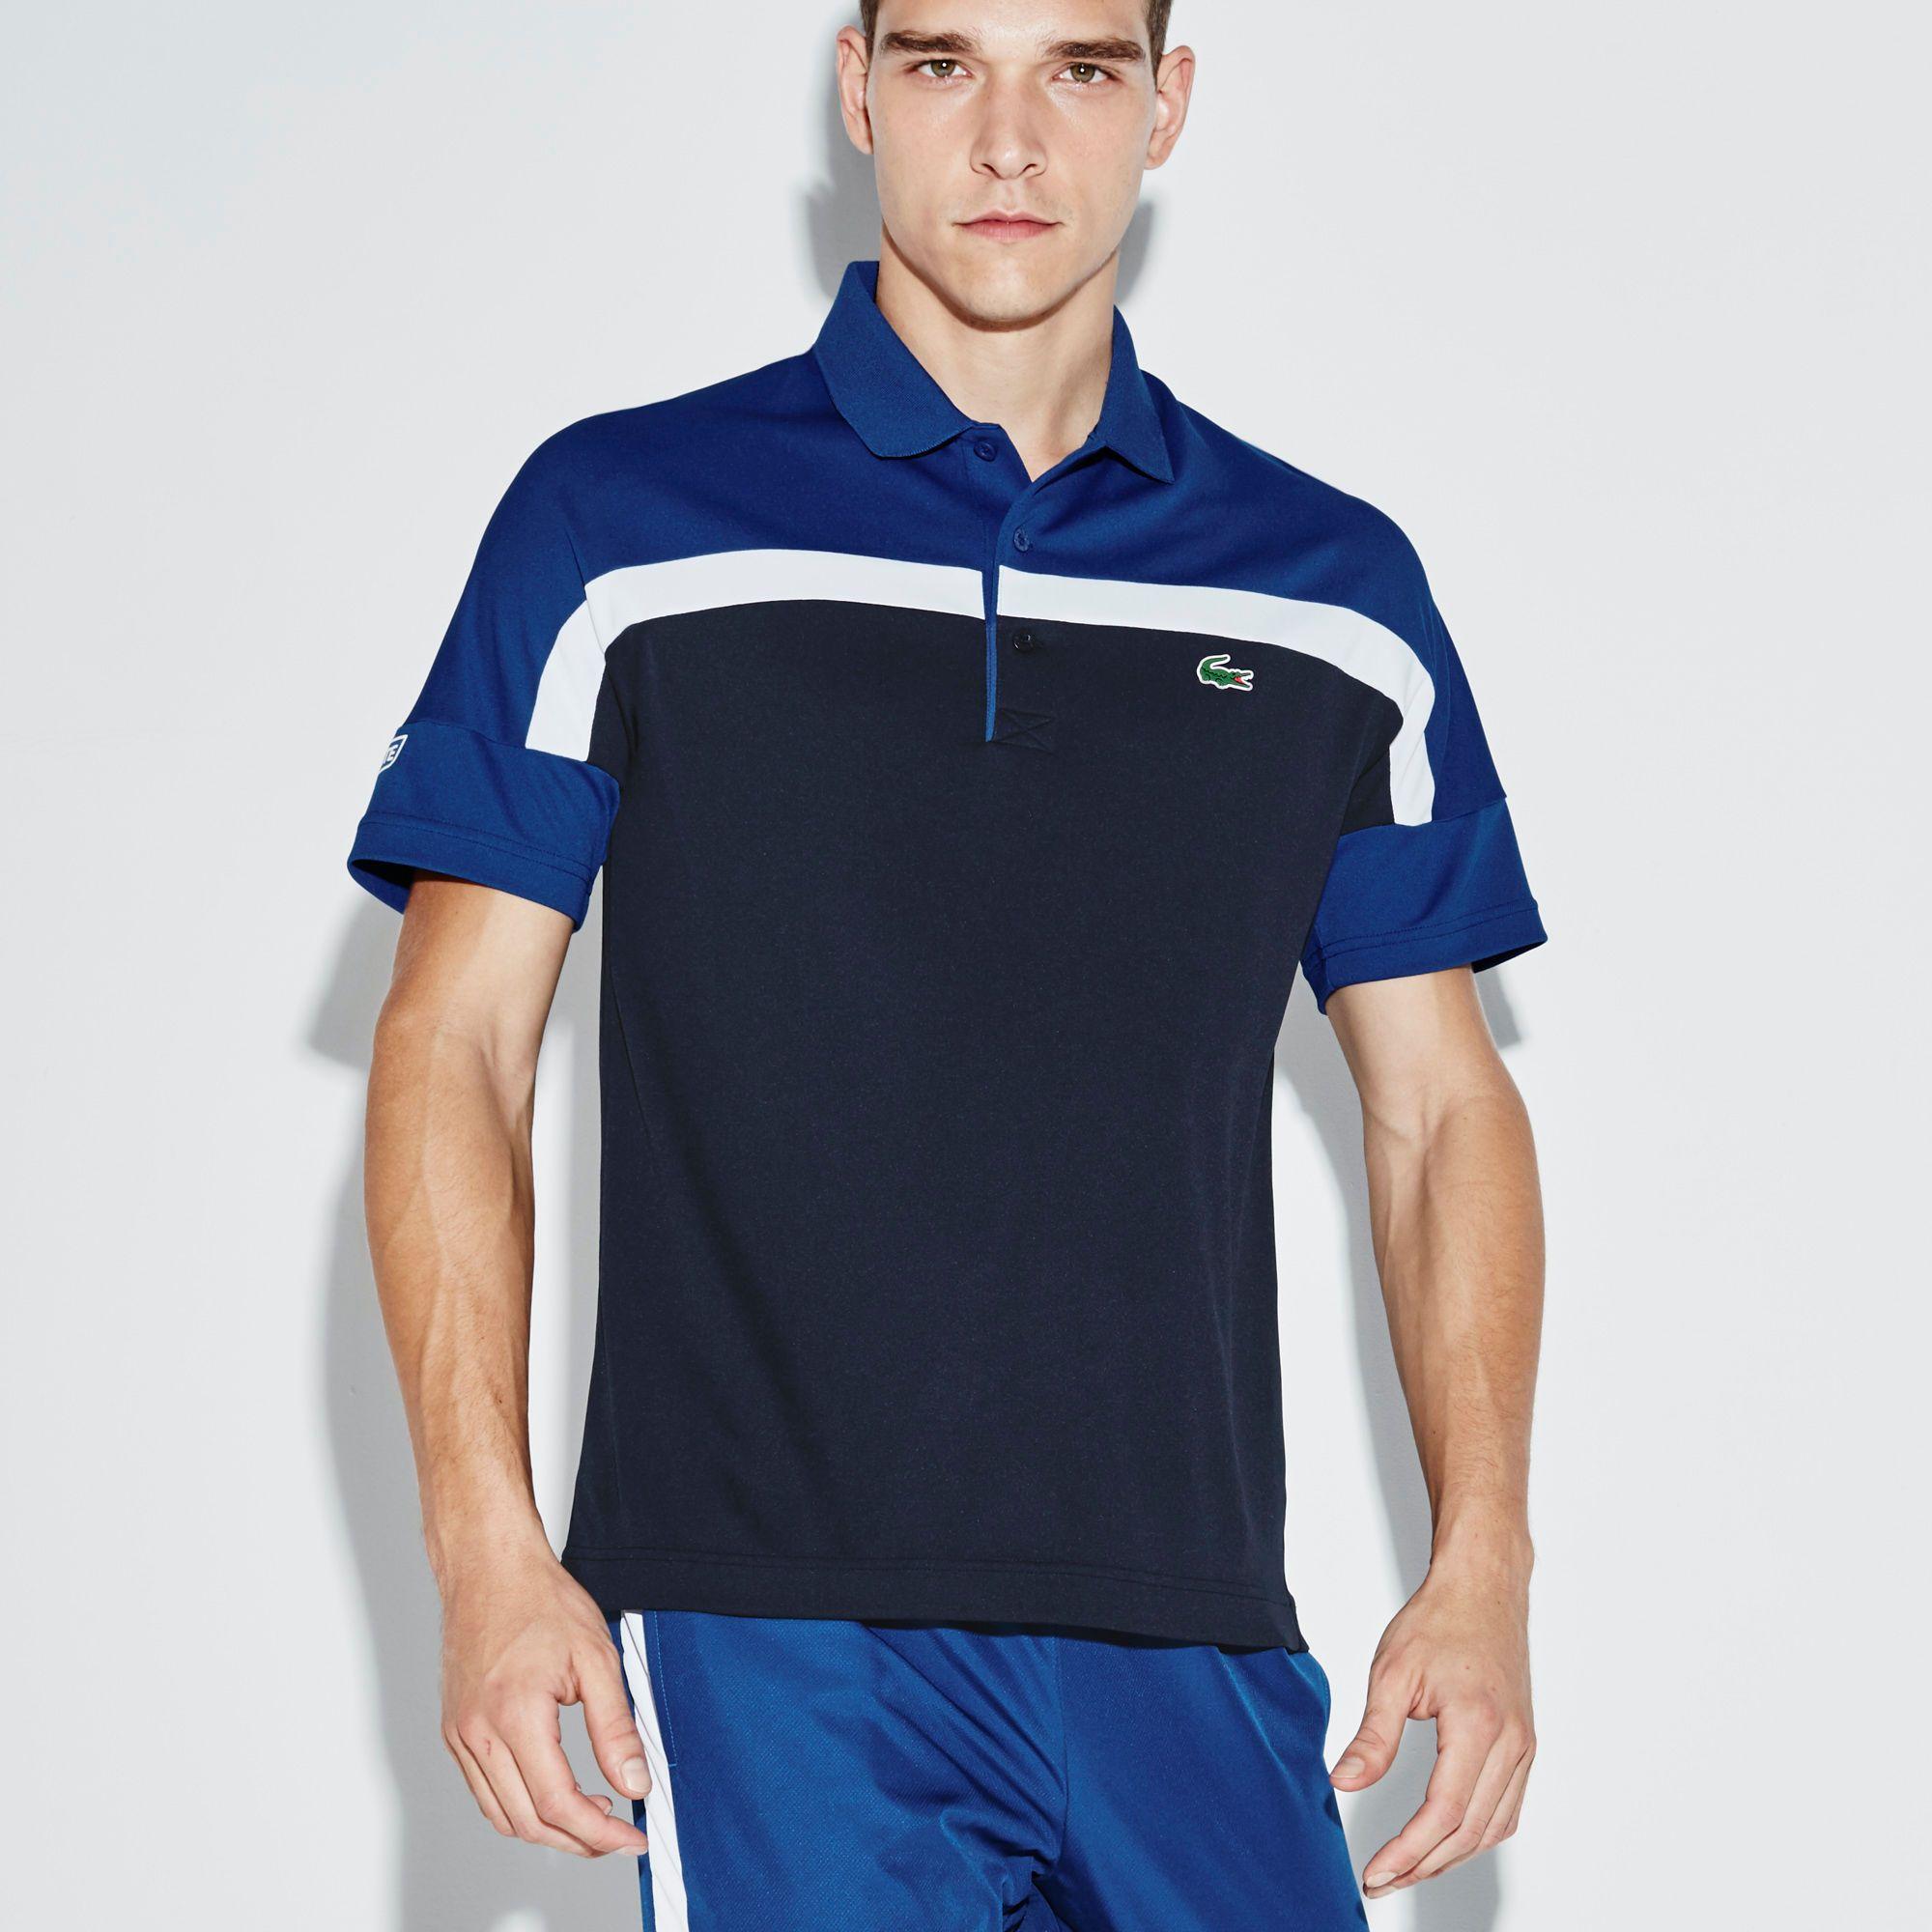 Lacoste SPORT Tennis polo in color block run-resistant ultra-dry piqué   LACOSTE 70fa493076